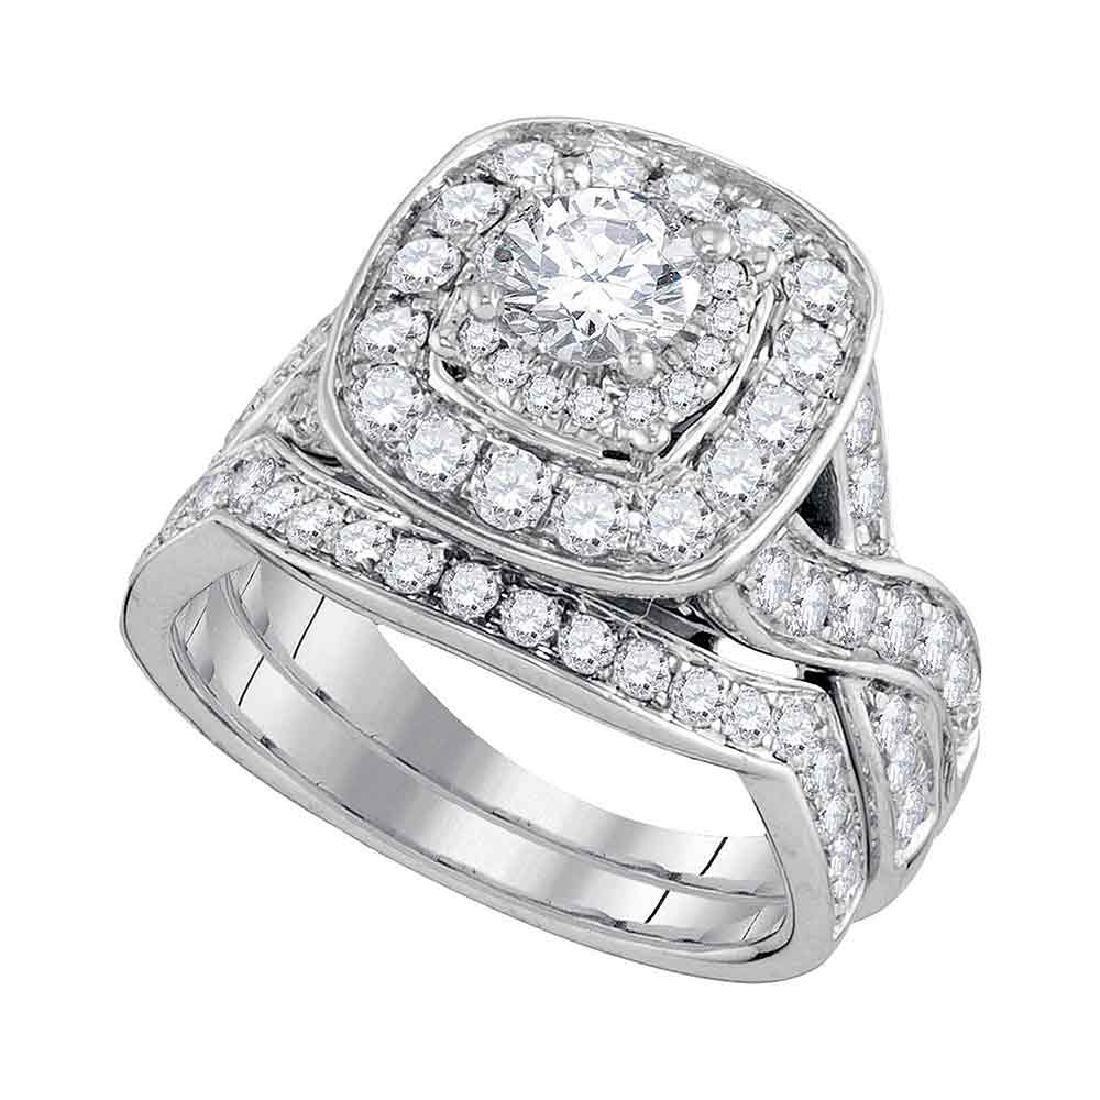 1.97 CTW Diamond Halo Bridal Engagement Ring 14KT White